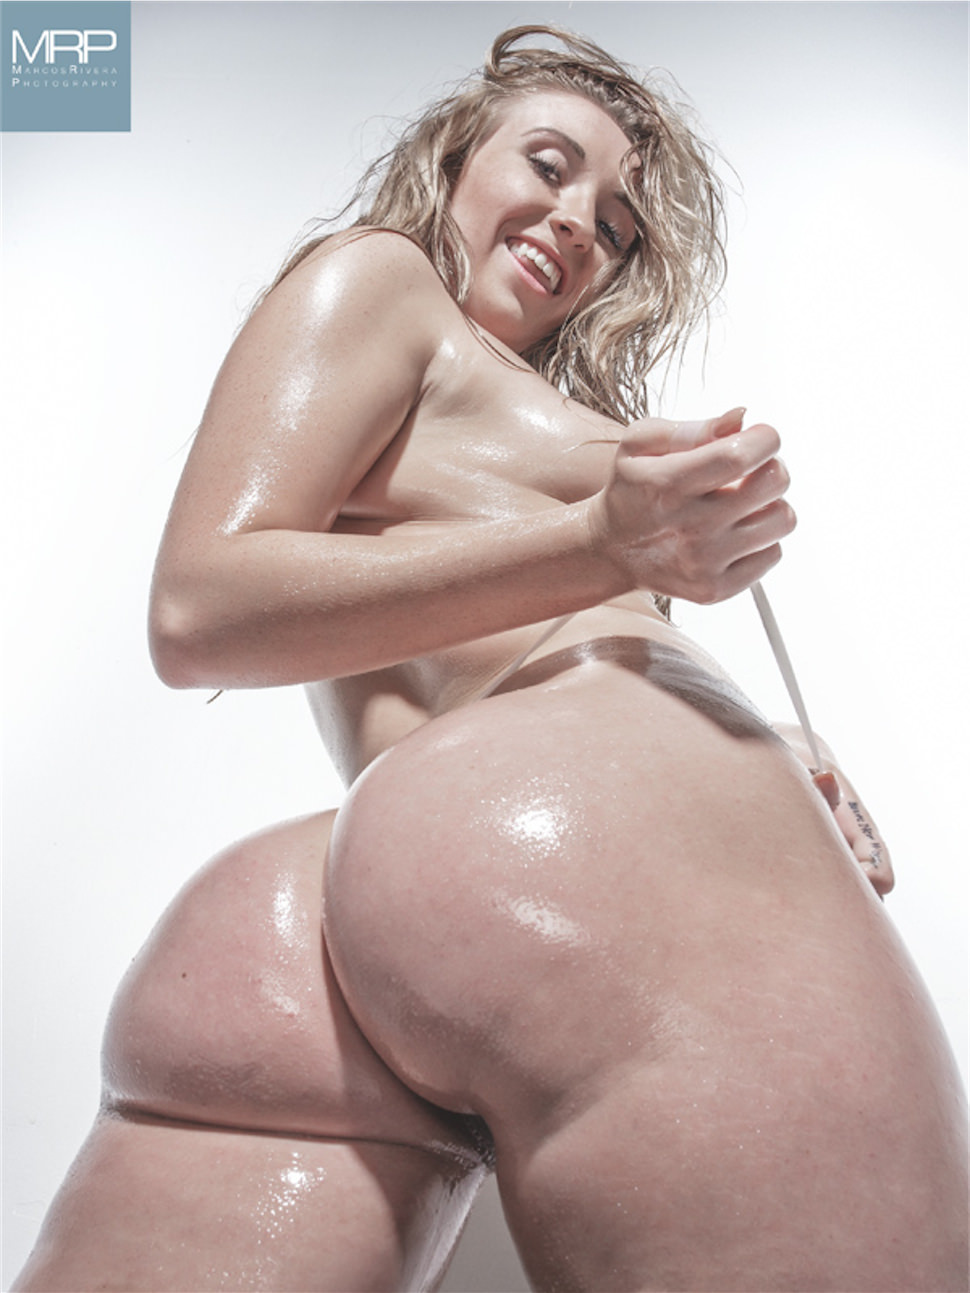 Alison Tyler Making Her Cash - Videos Porno Gratis -